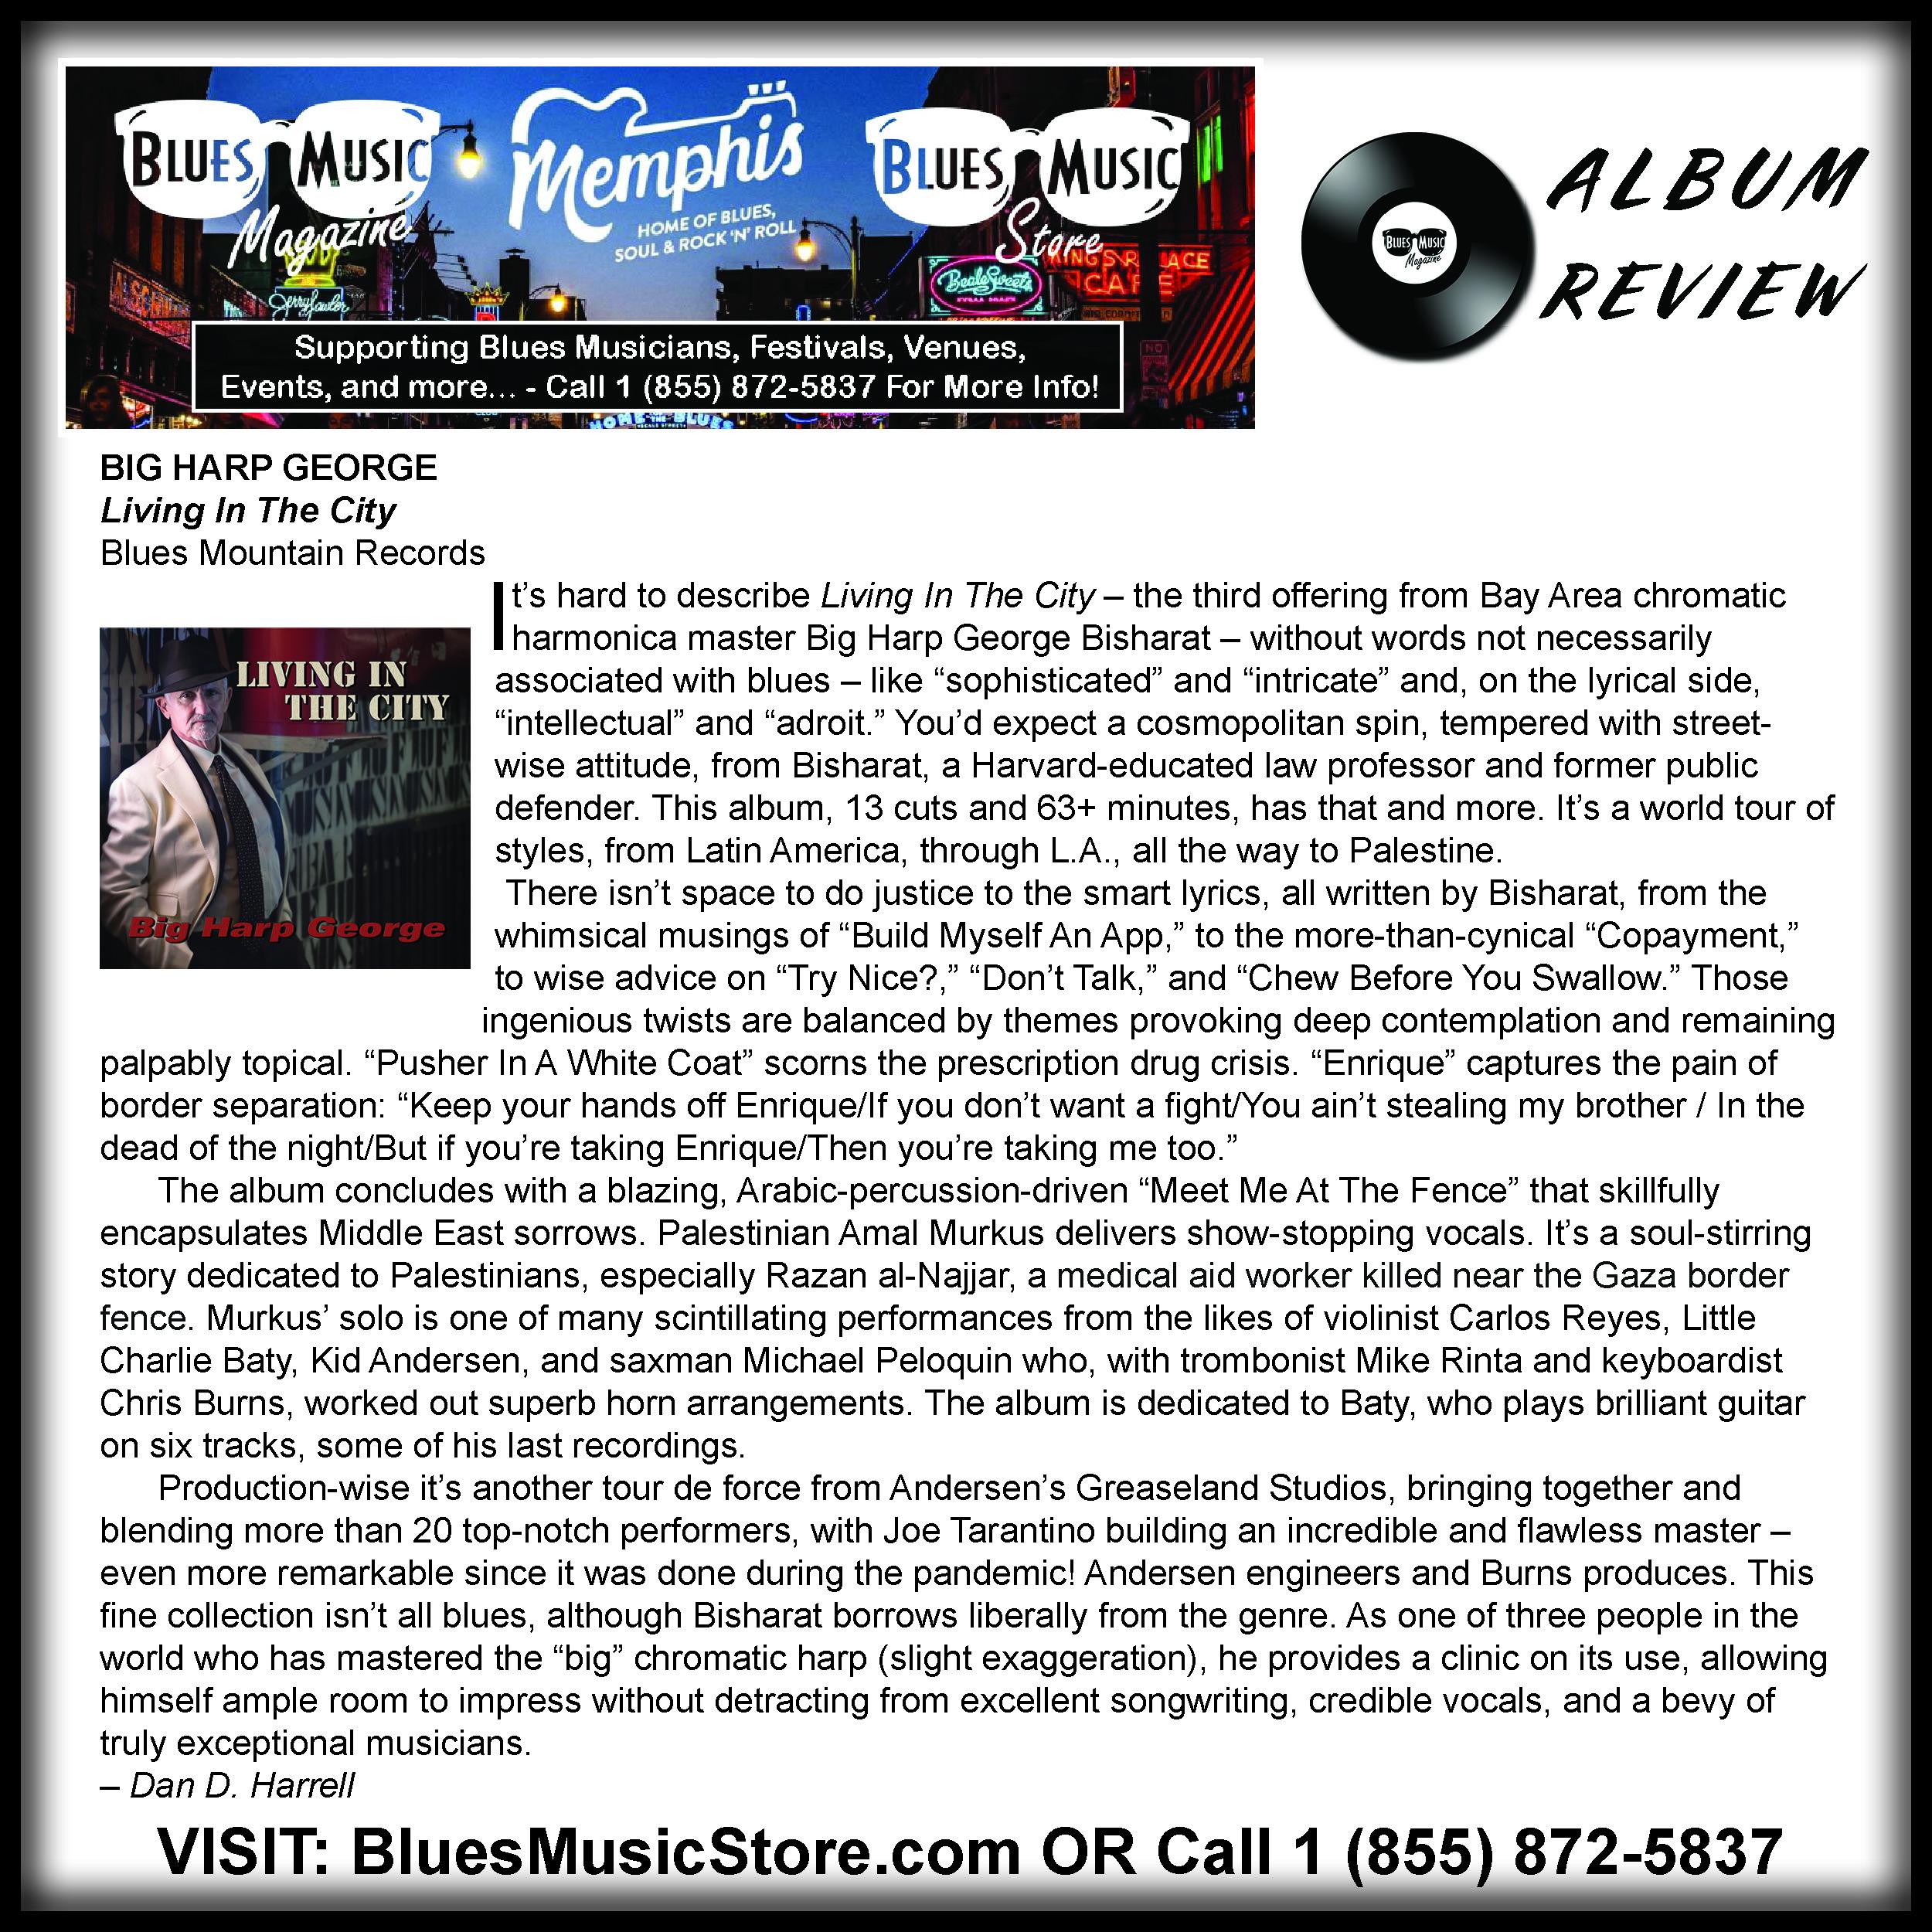 big-harp-george-review.jpg